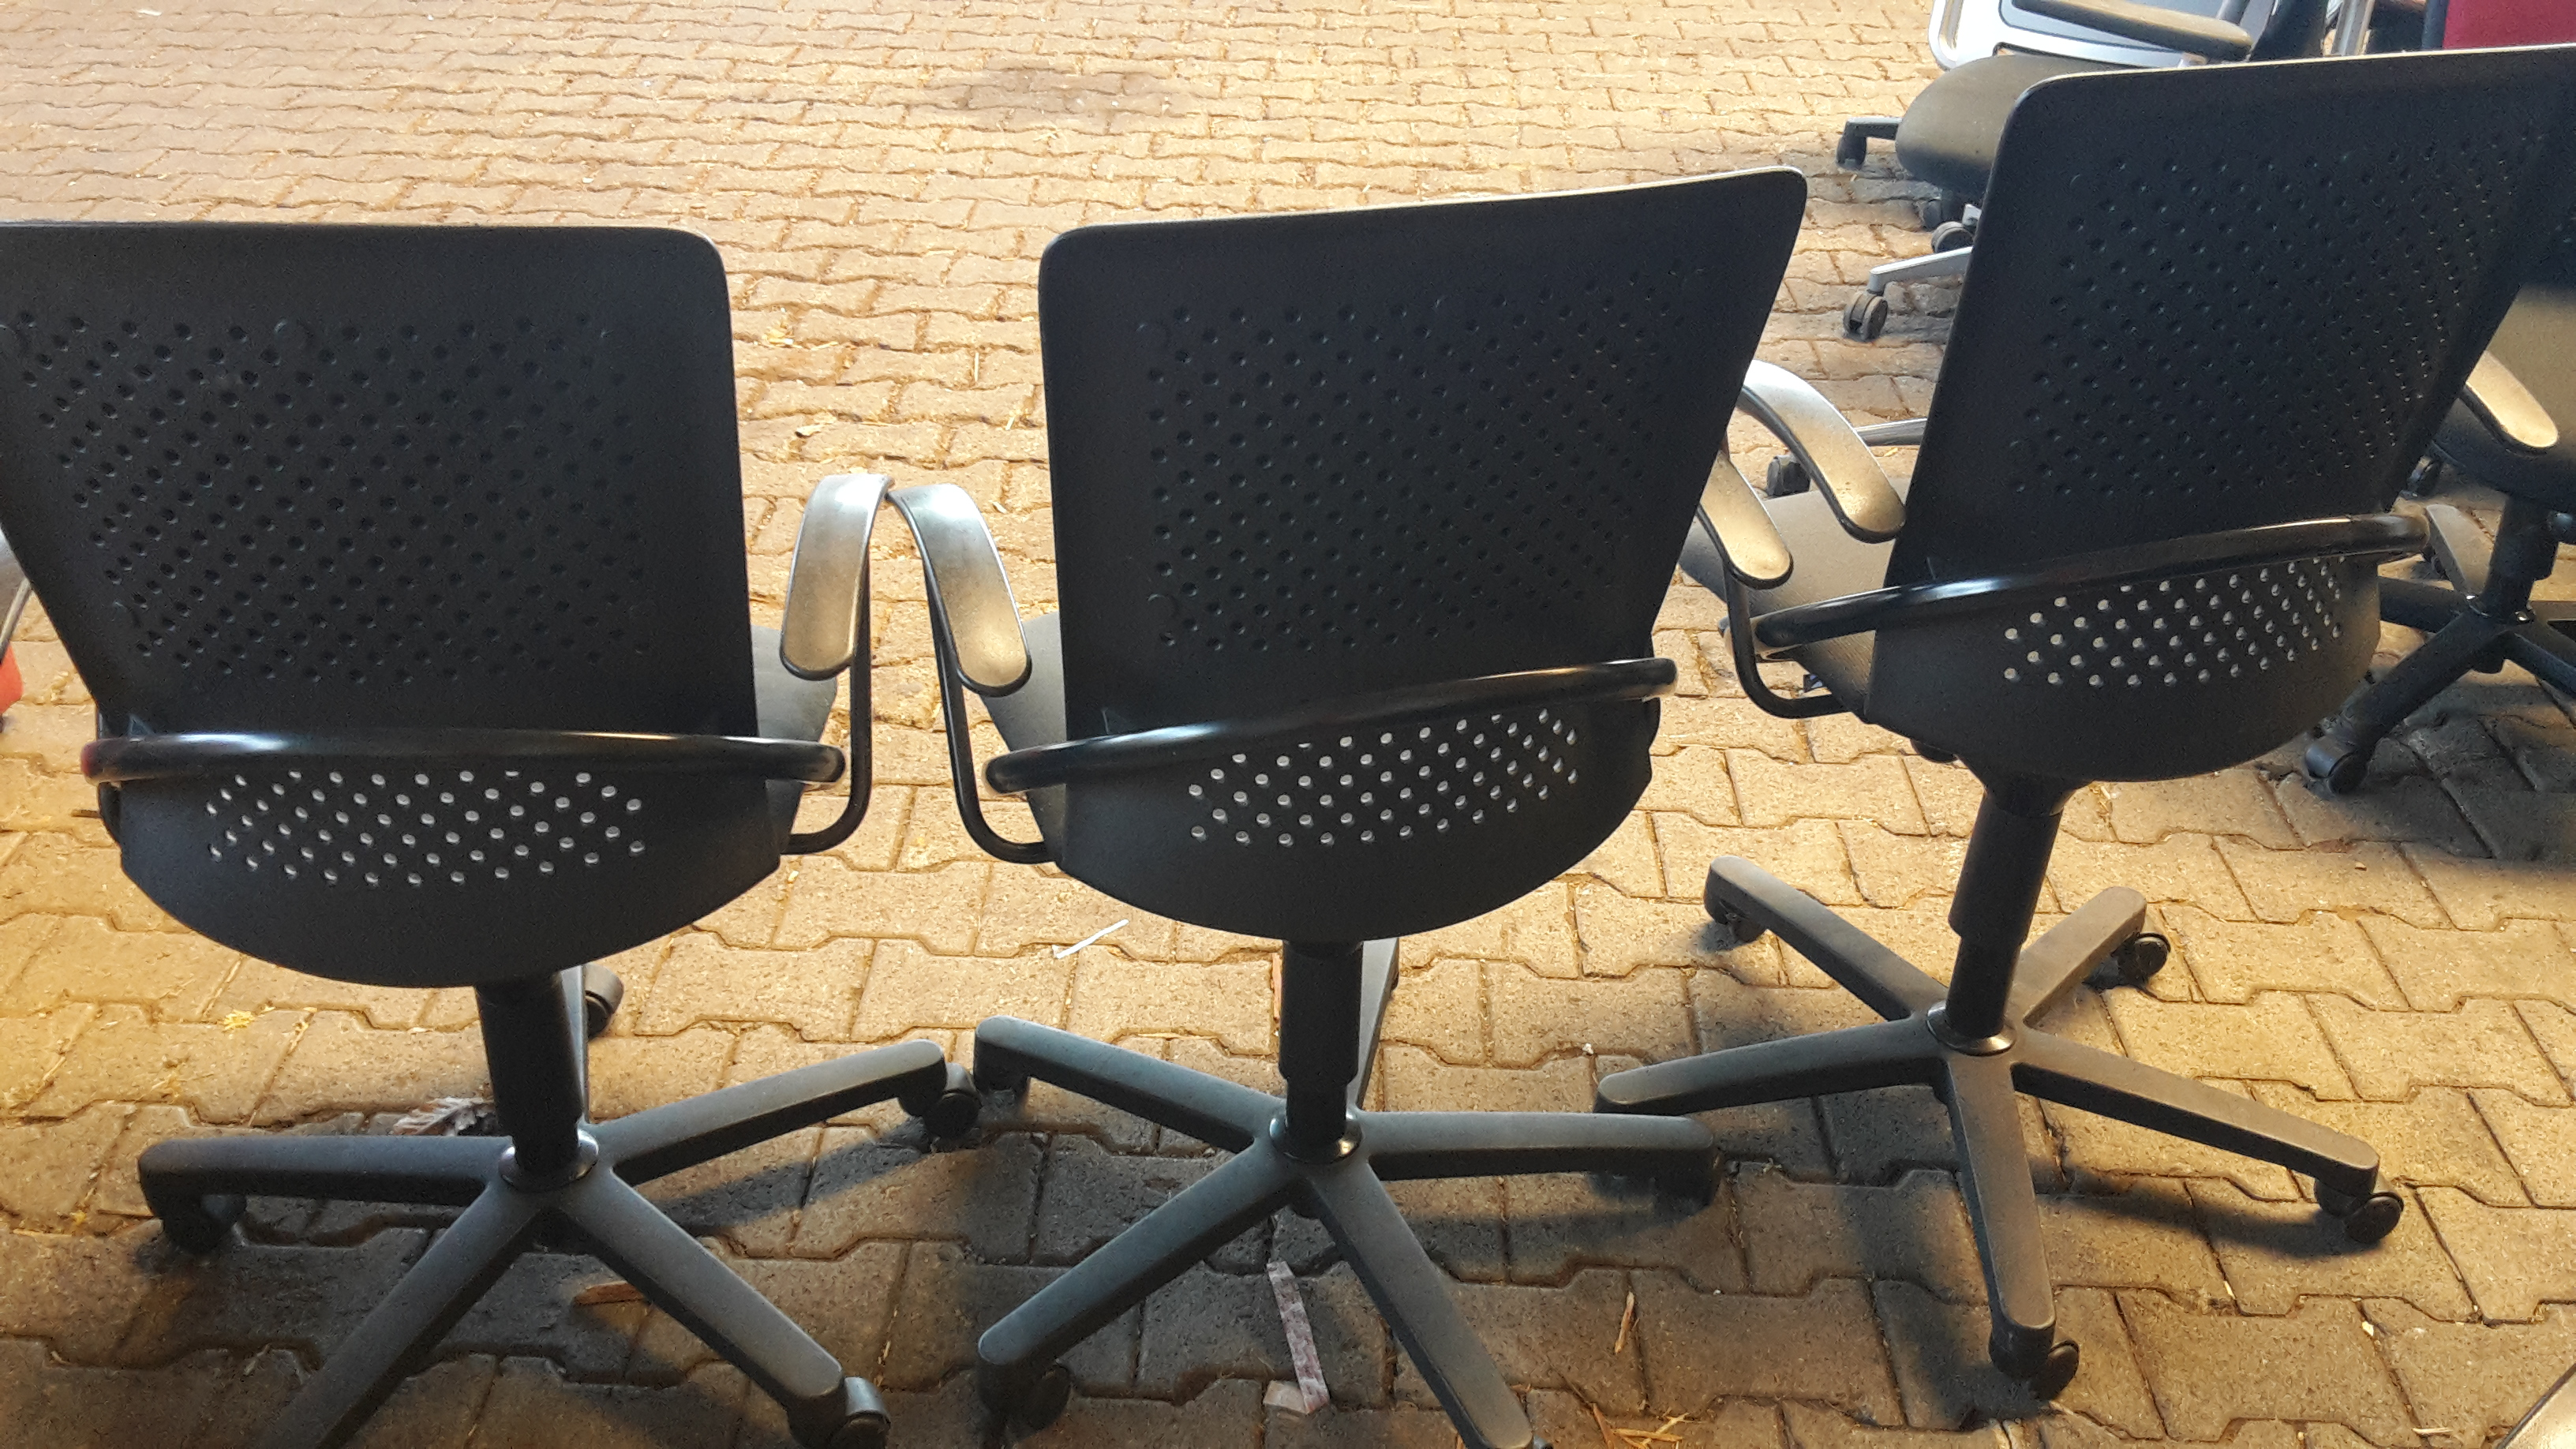 König Neurath Bürostuhl Gebraucht Gut In Schuss 39